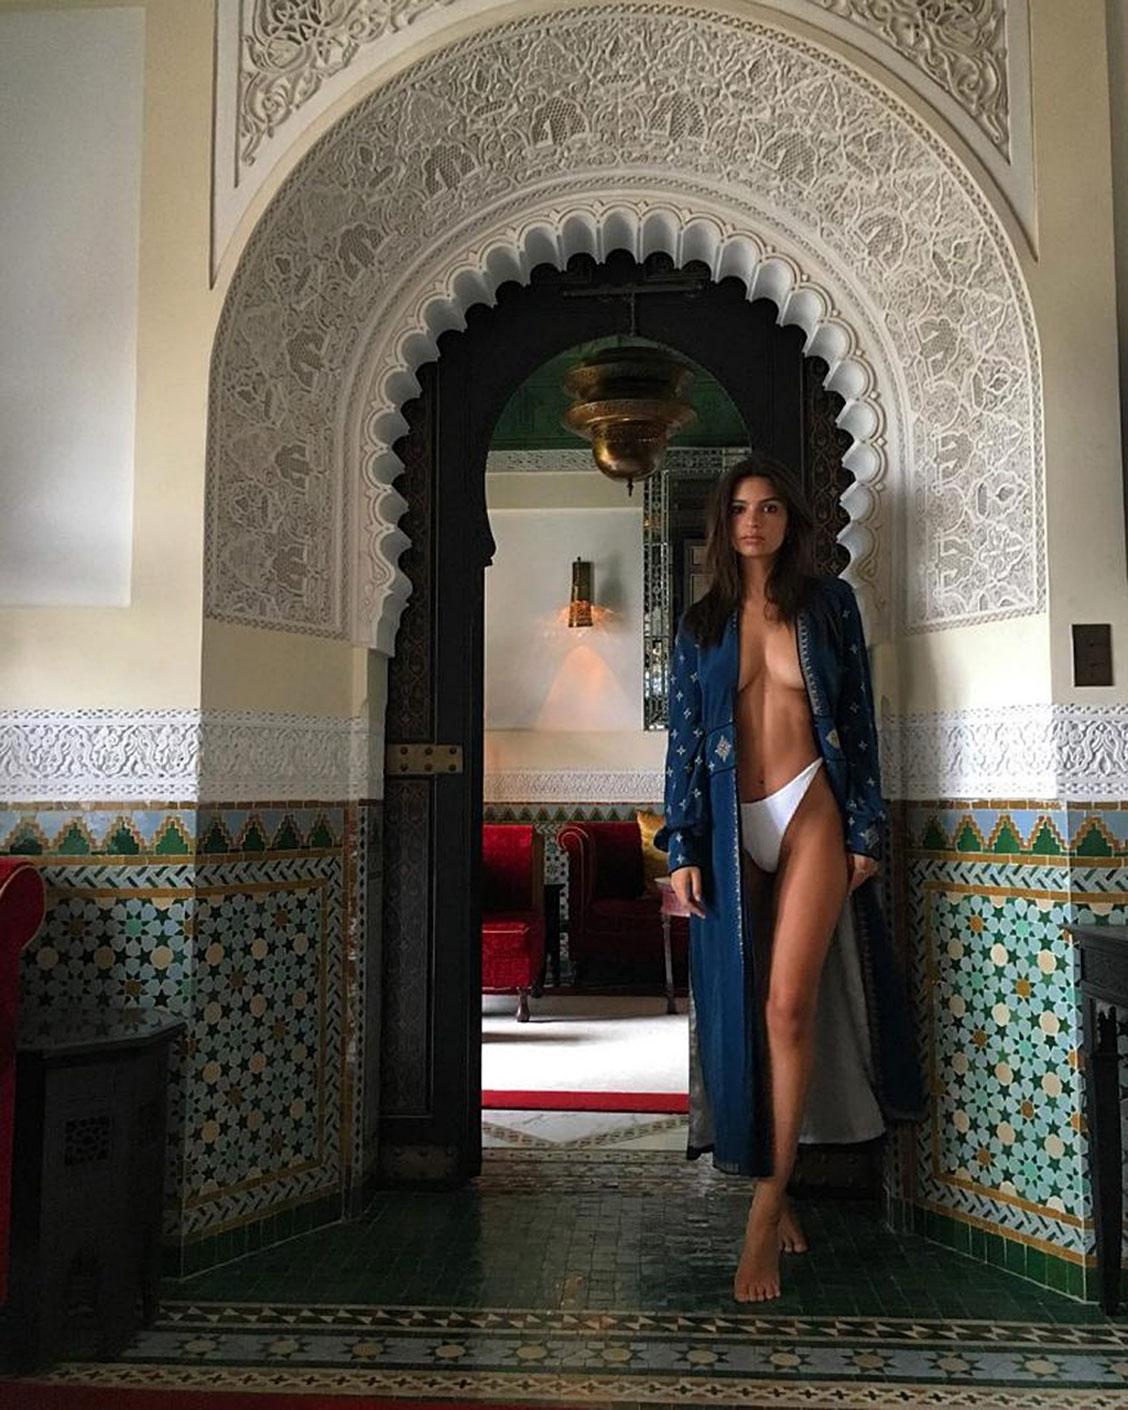 Emily ratajkowski adores topless plus deep cleavage pics nude (47 photo)